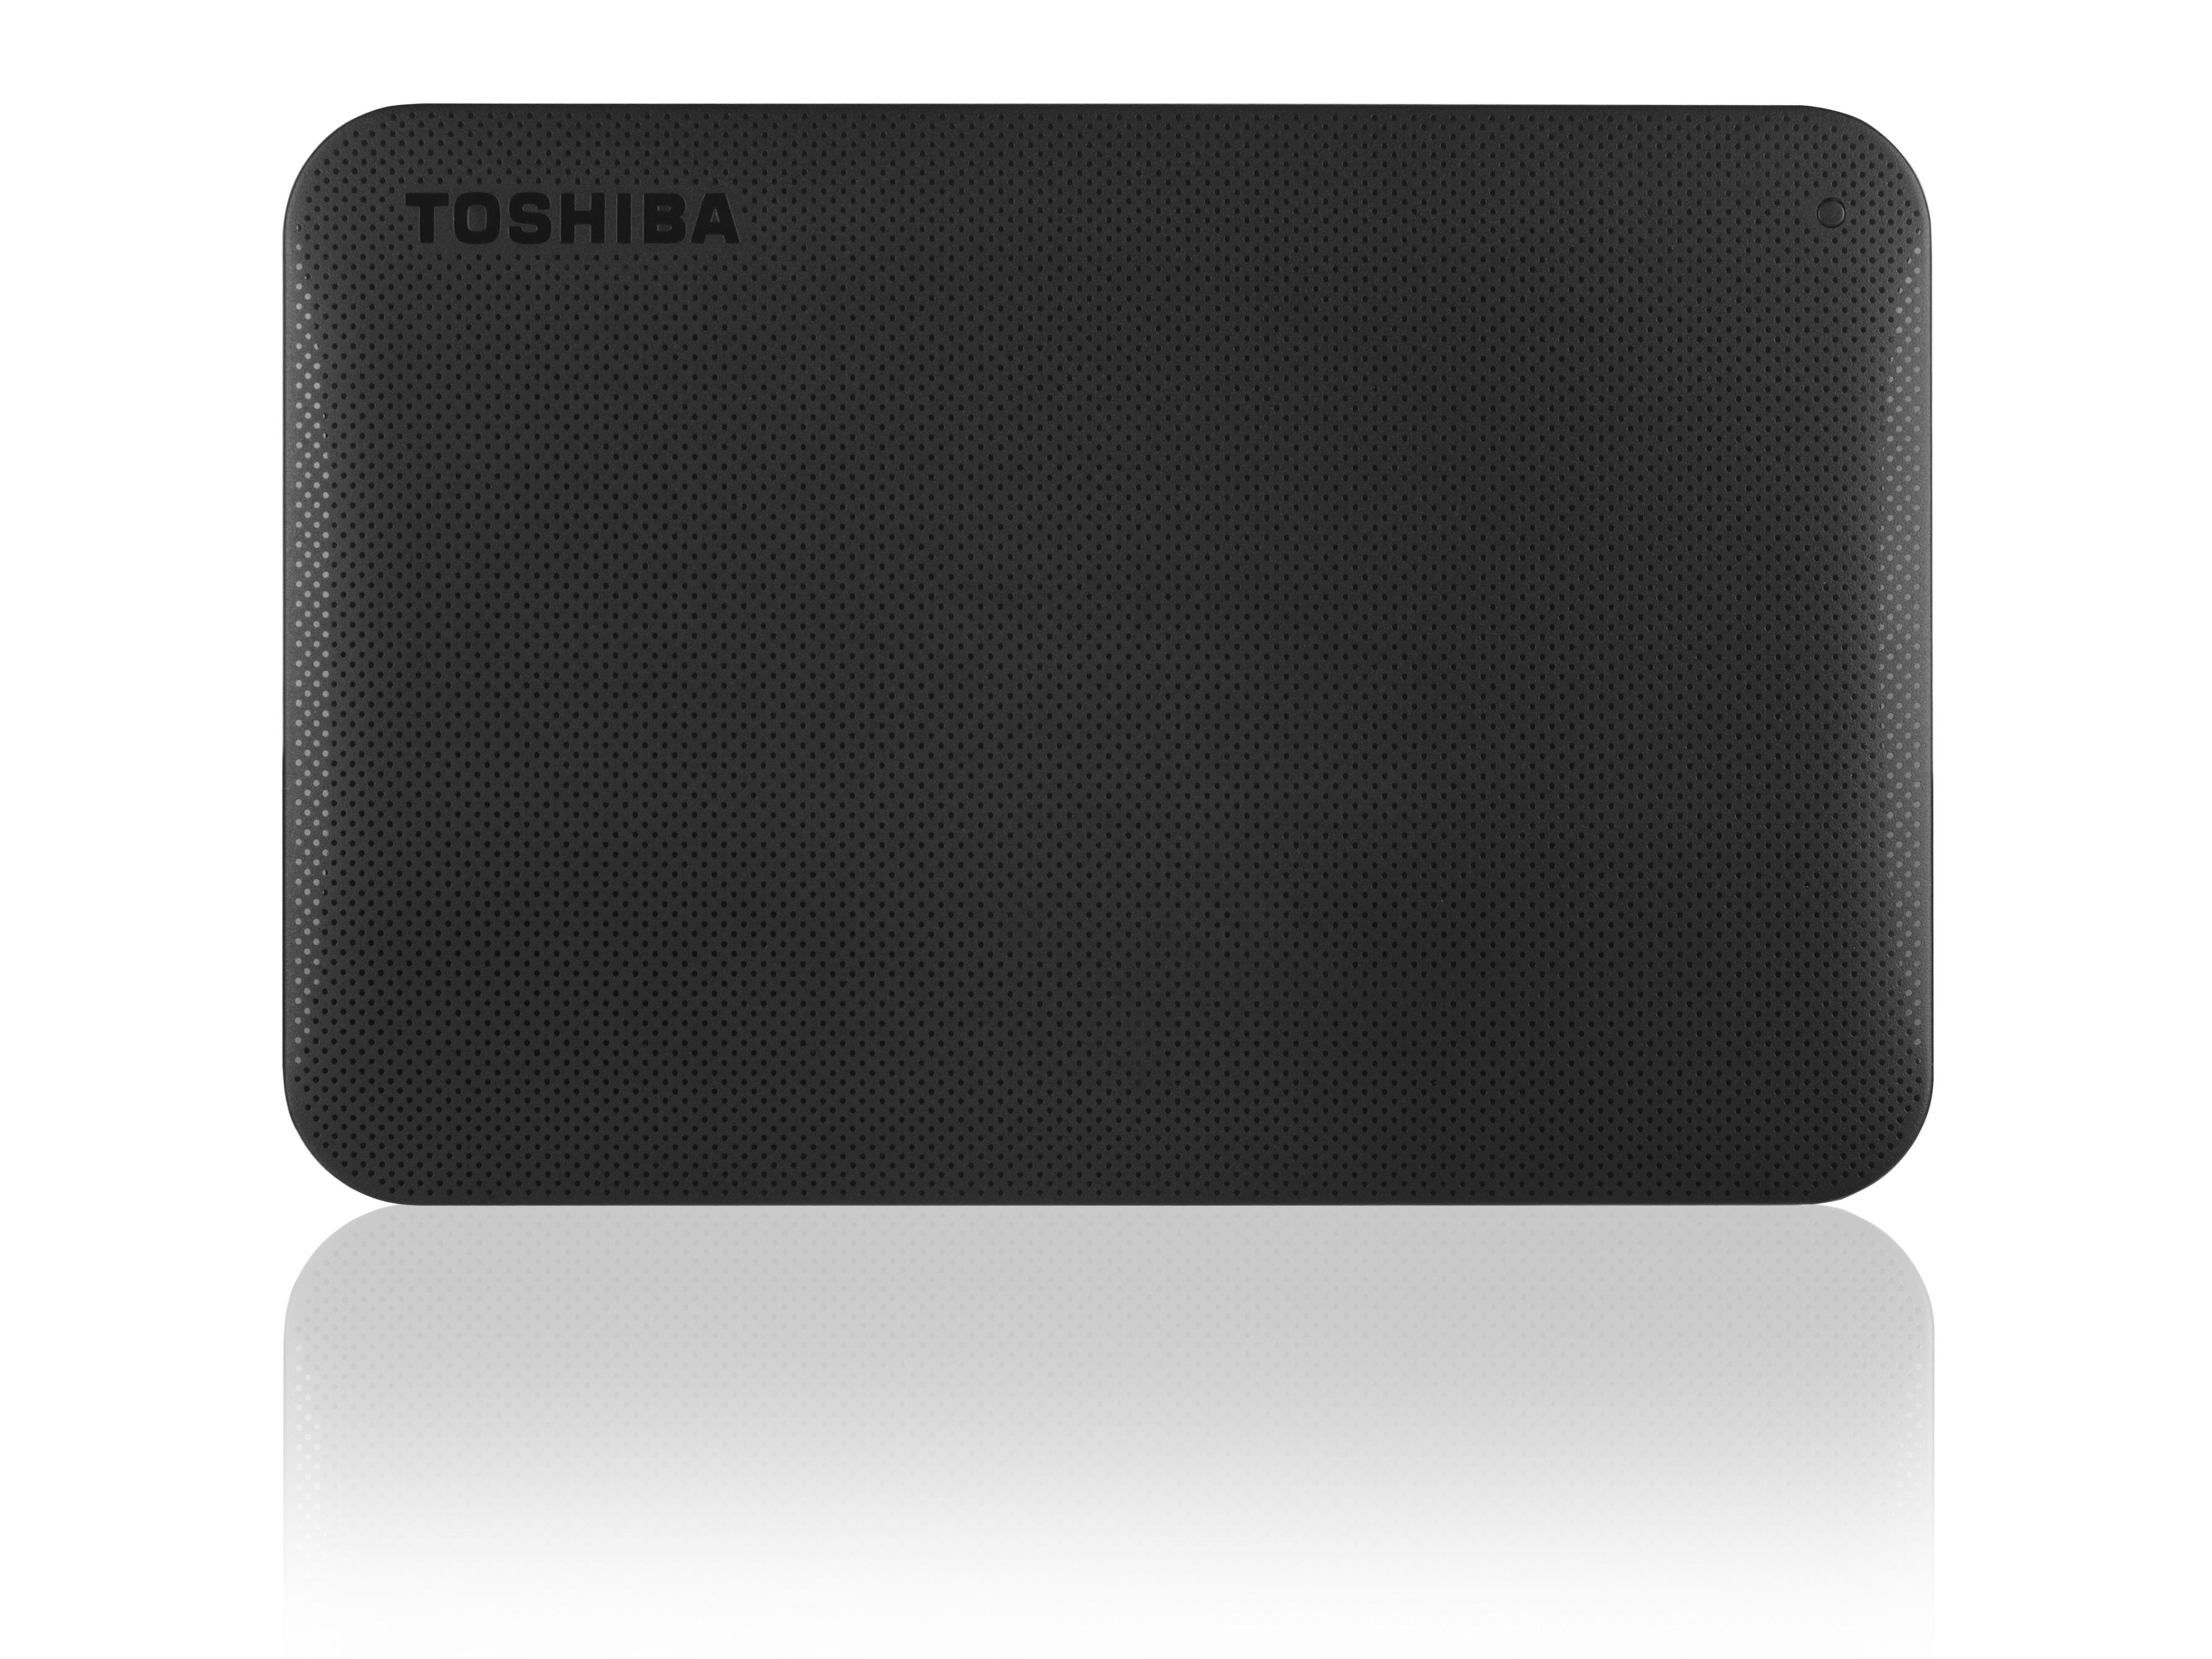 Toshiba externe harde schijf Canvio Ready 1TB zwart